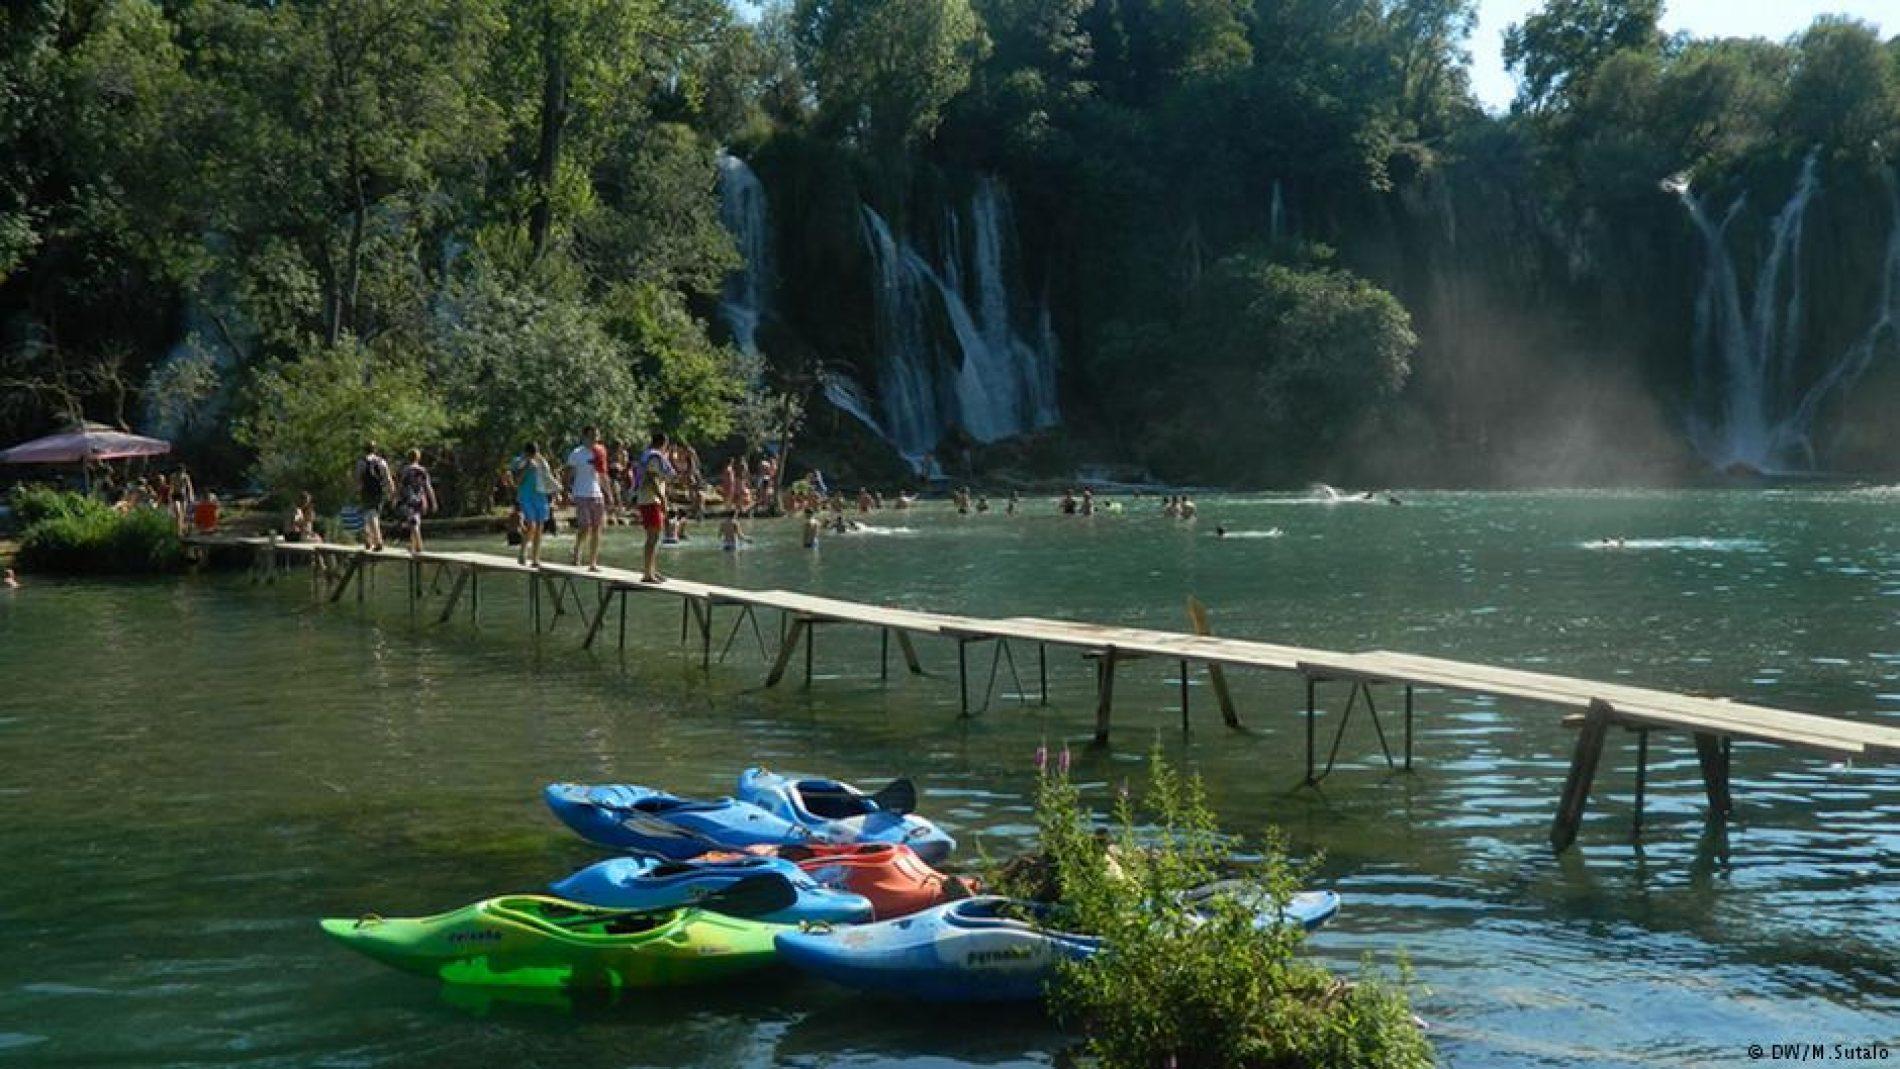 Austrijska novinarka o Bosni i Hercegovini: Predivni krajolici, gostoljubivi ljudi i pristup moru